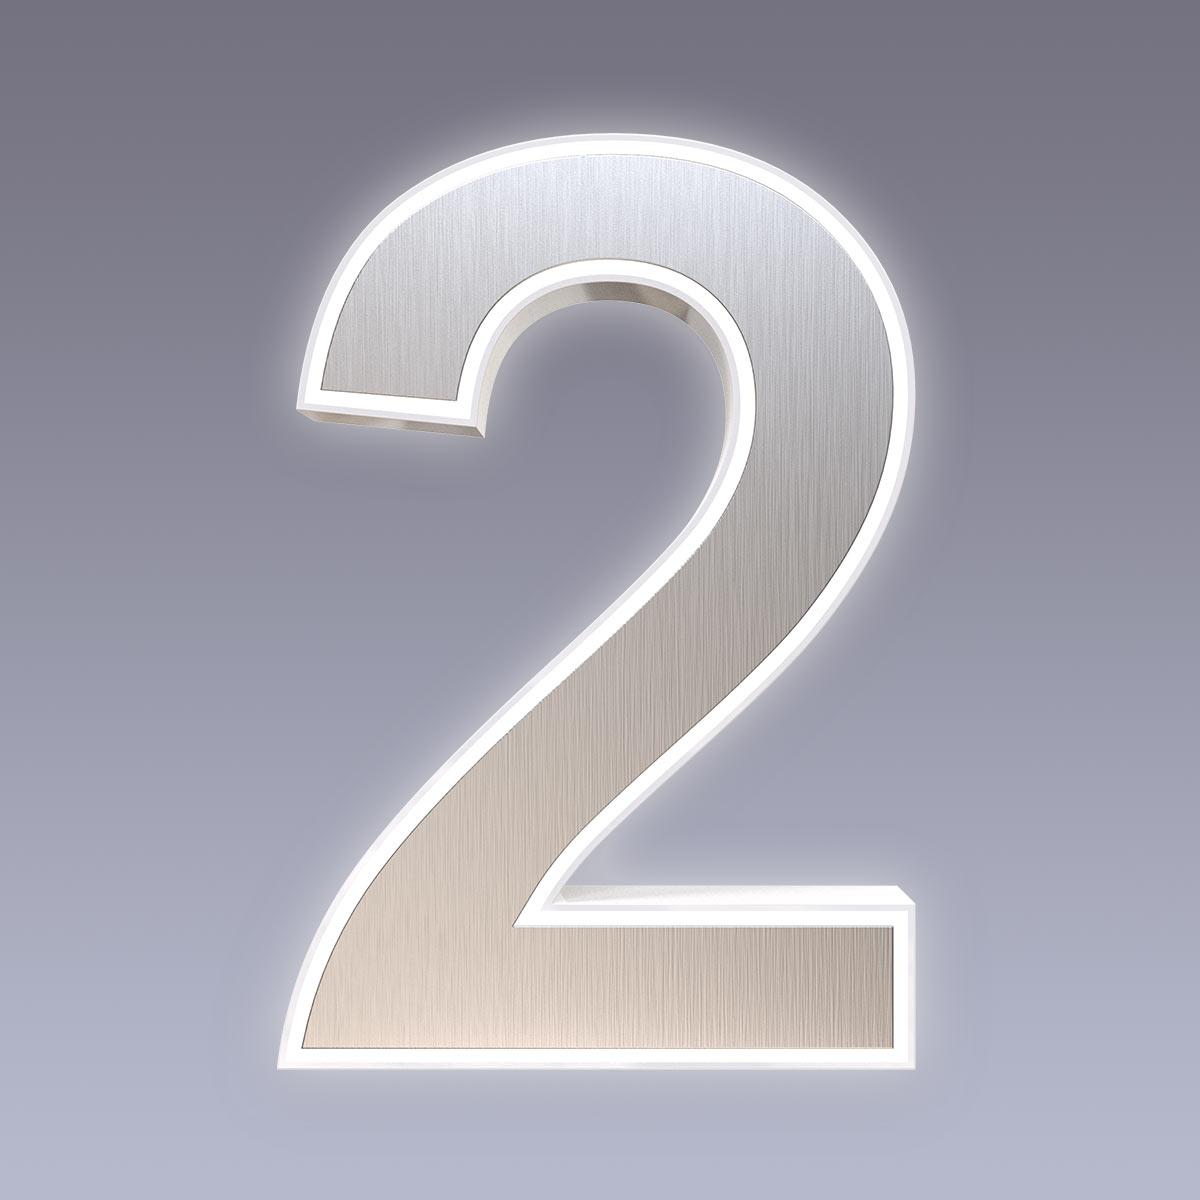 Cover für 15cm Hausnummer 2 Edelstahl Arial selbstklebend